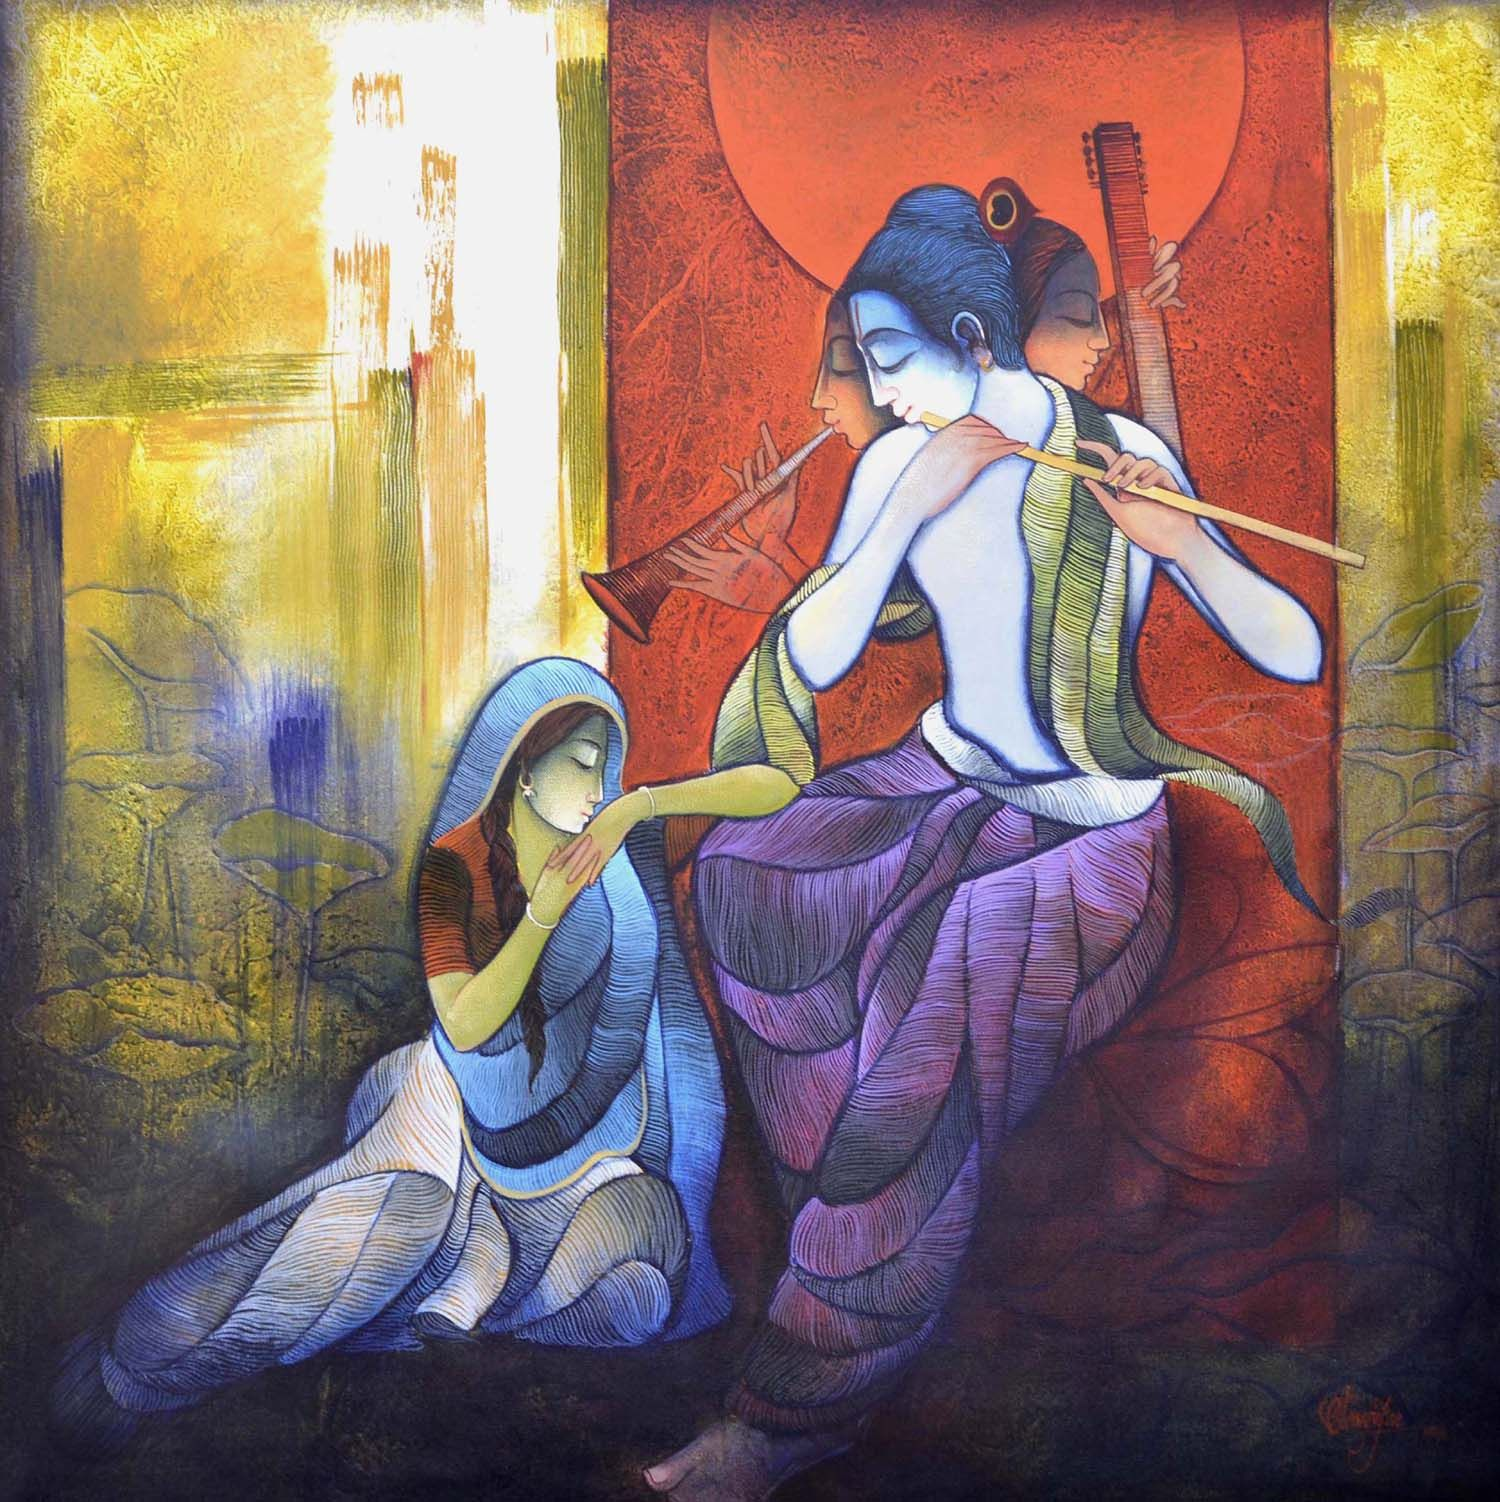 radha krishna - Ram Onkar | Arts | Pinterest | Krishna ...